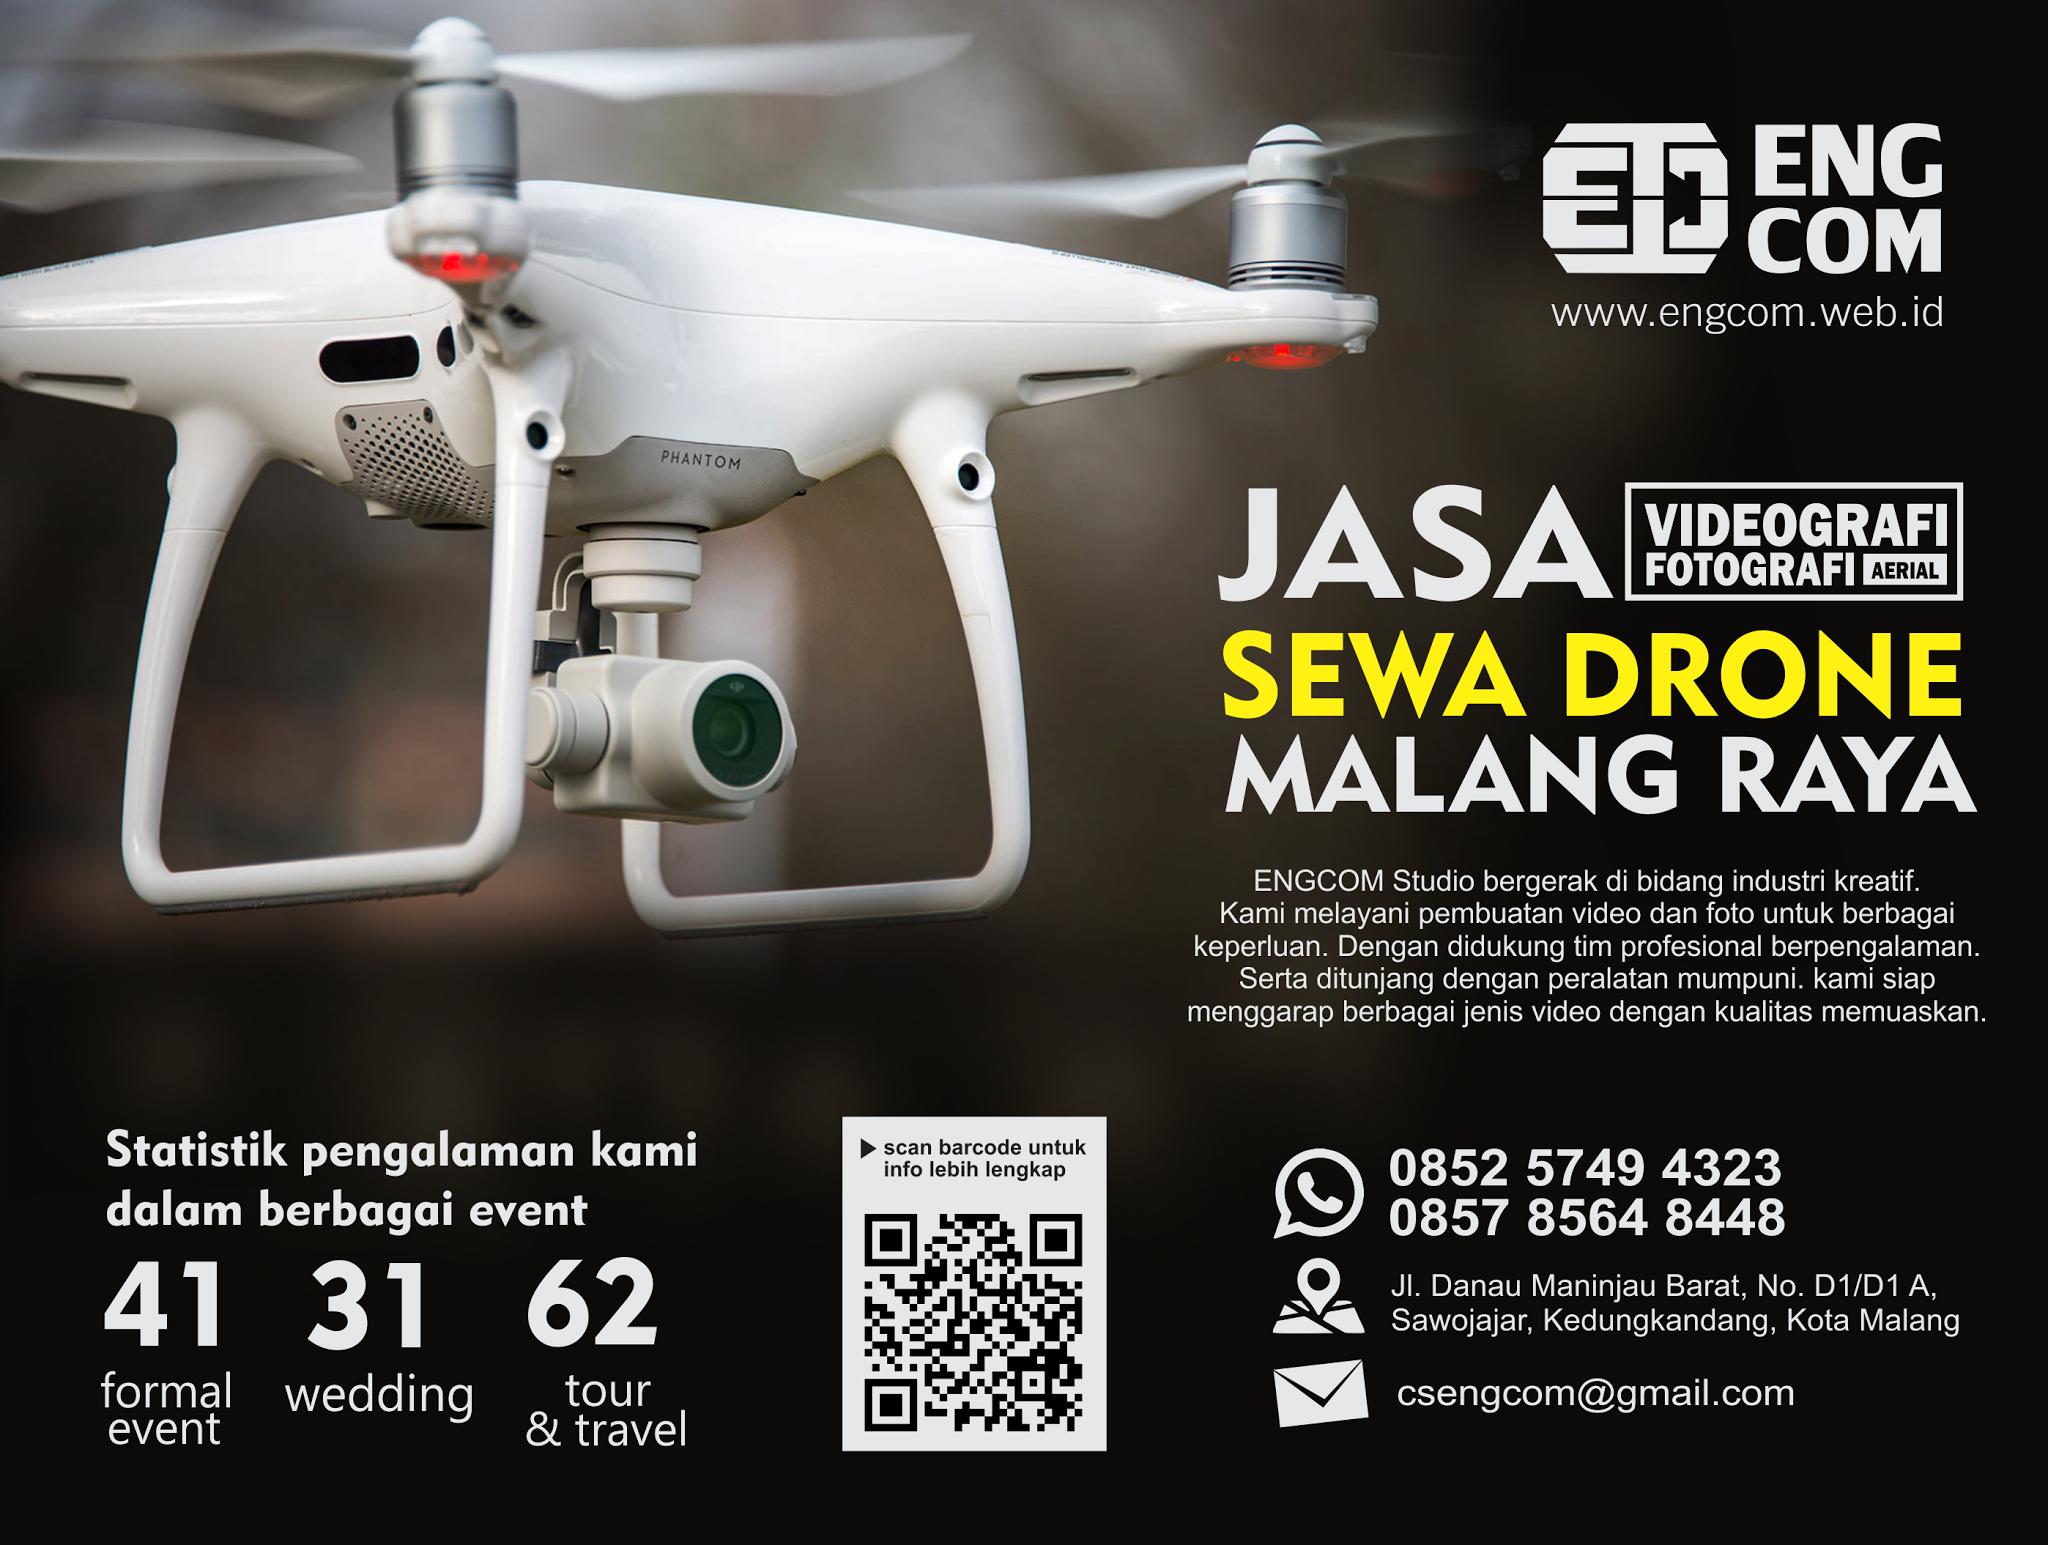 Brosur Sewa Drone di Malang Raya